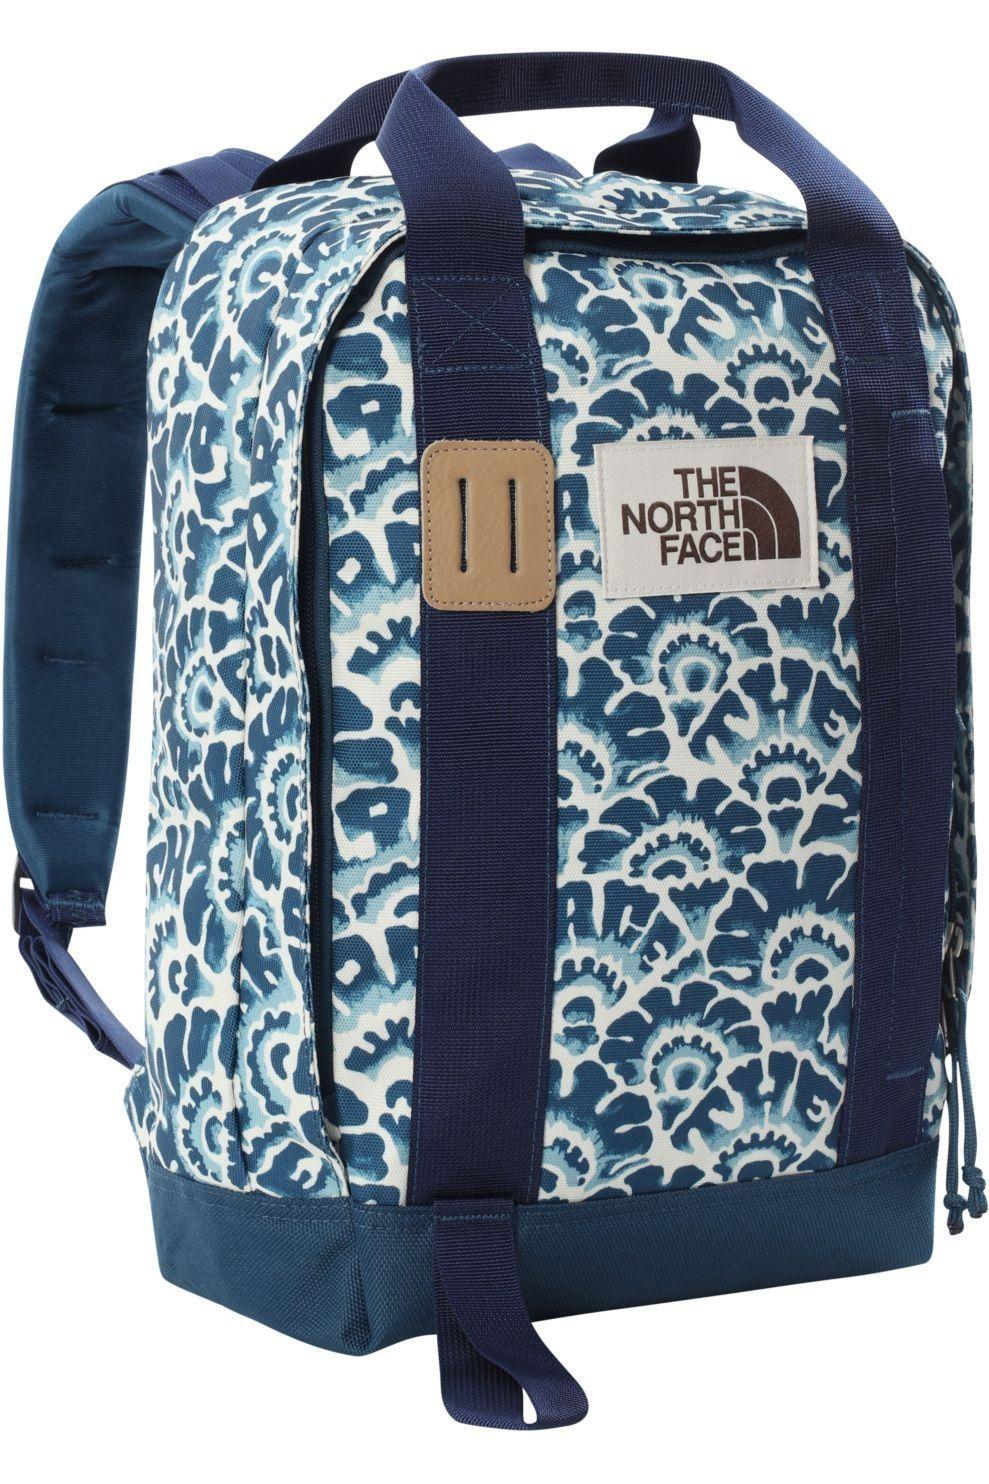 The North Face Dagrugzak Tote Pack - Blauw